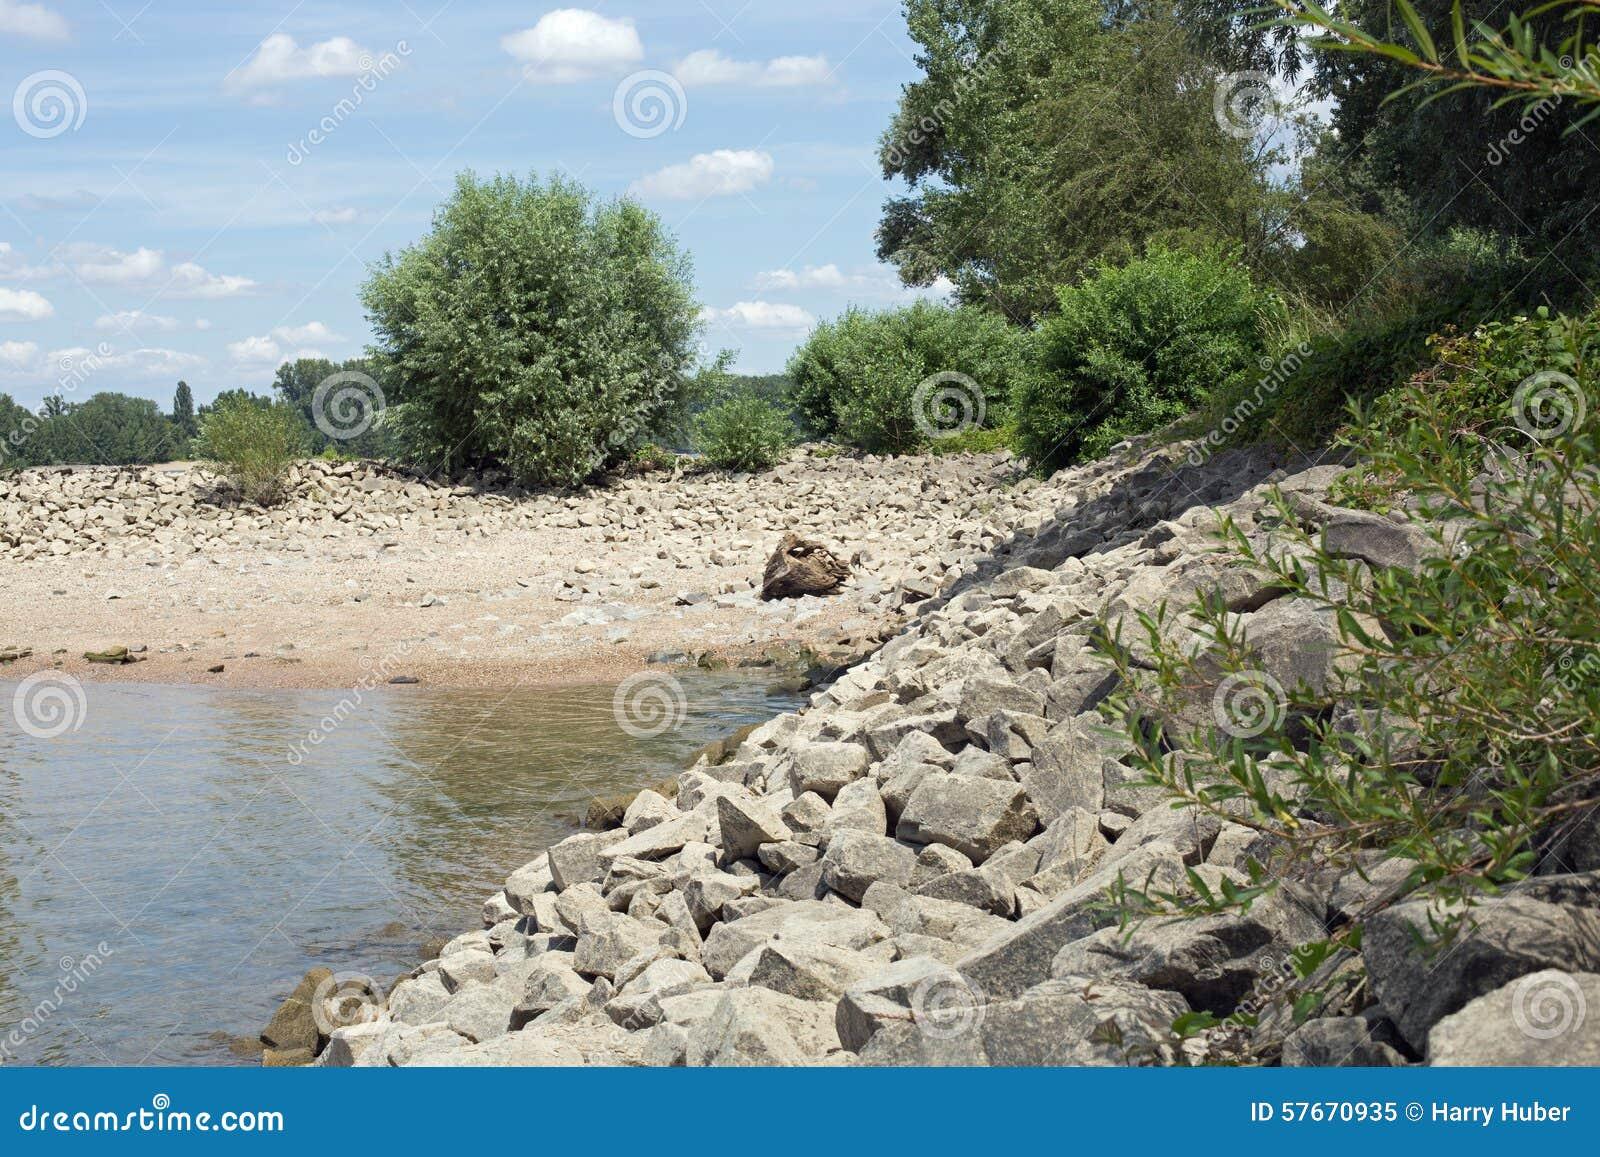 Берег Рейна (Rhein)